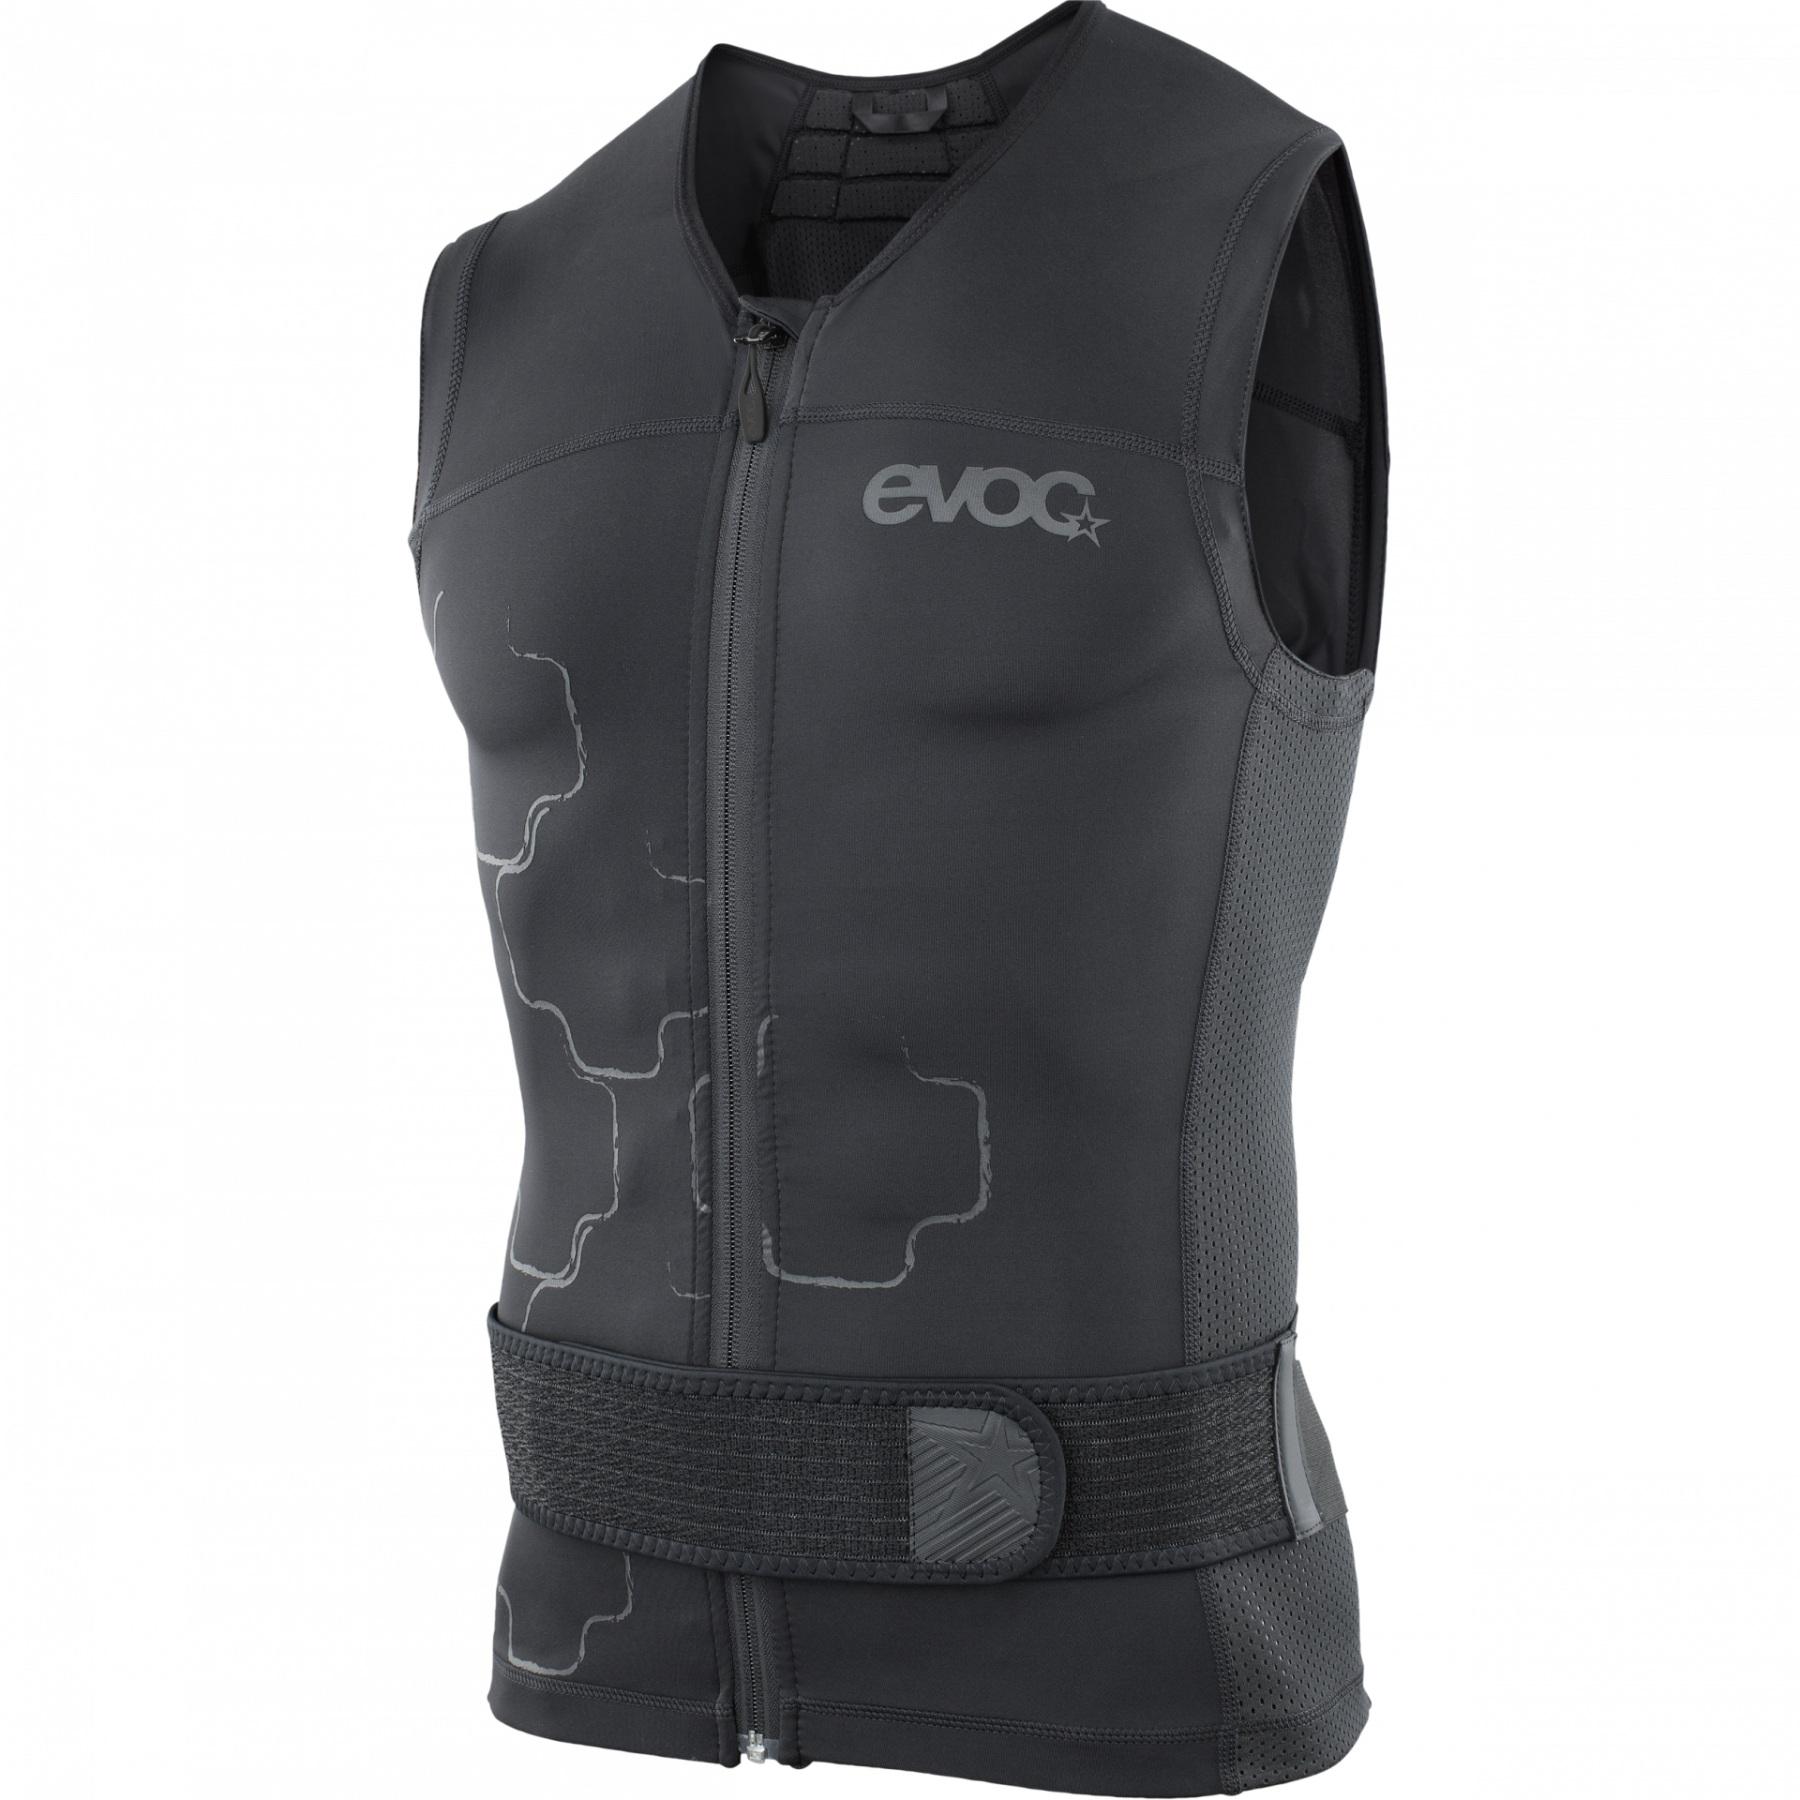 Produktbild von Evoc Protector Vest Lite Men Protektorenweste - Black